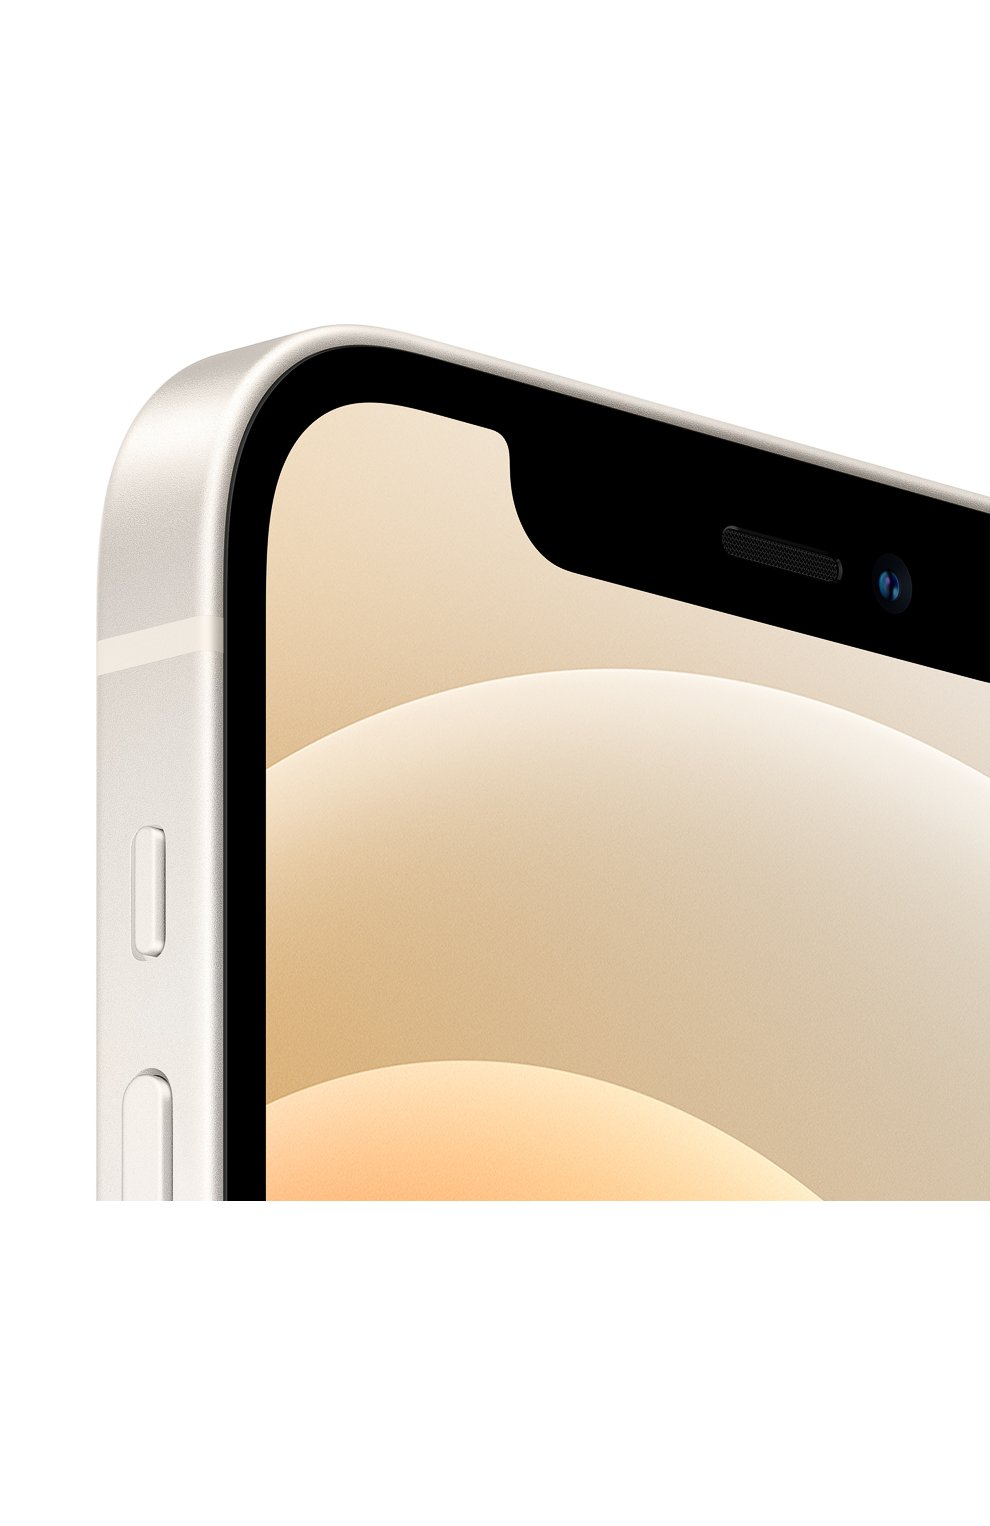 Мужские iphone 12 128gb white APPLE  white цвета, арт. MGJC3RU/A | Фото 2